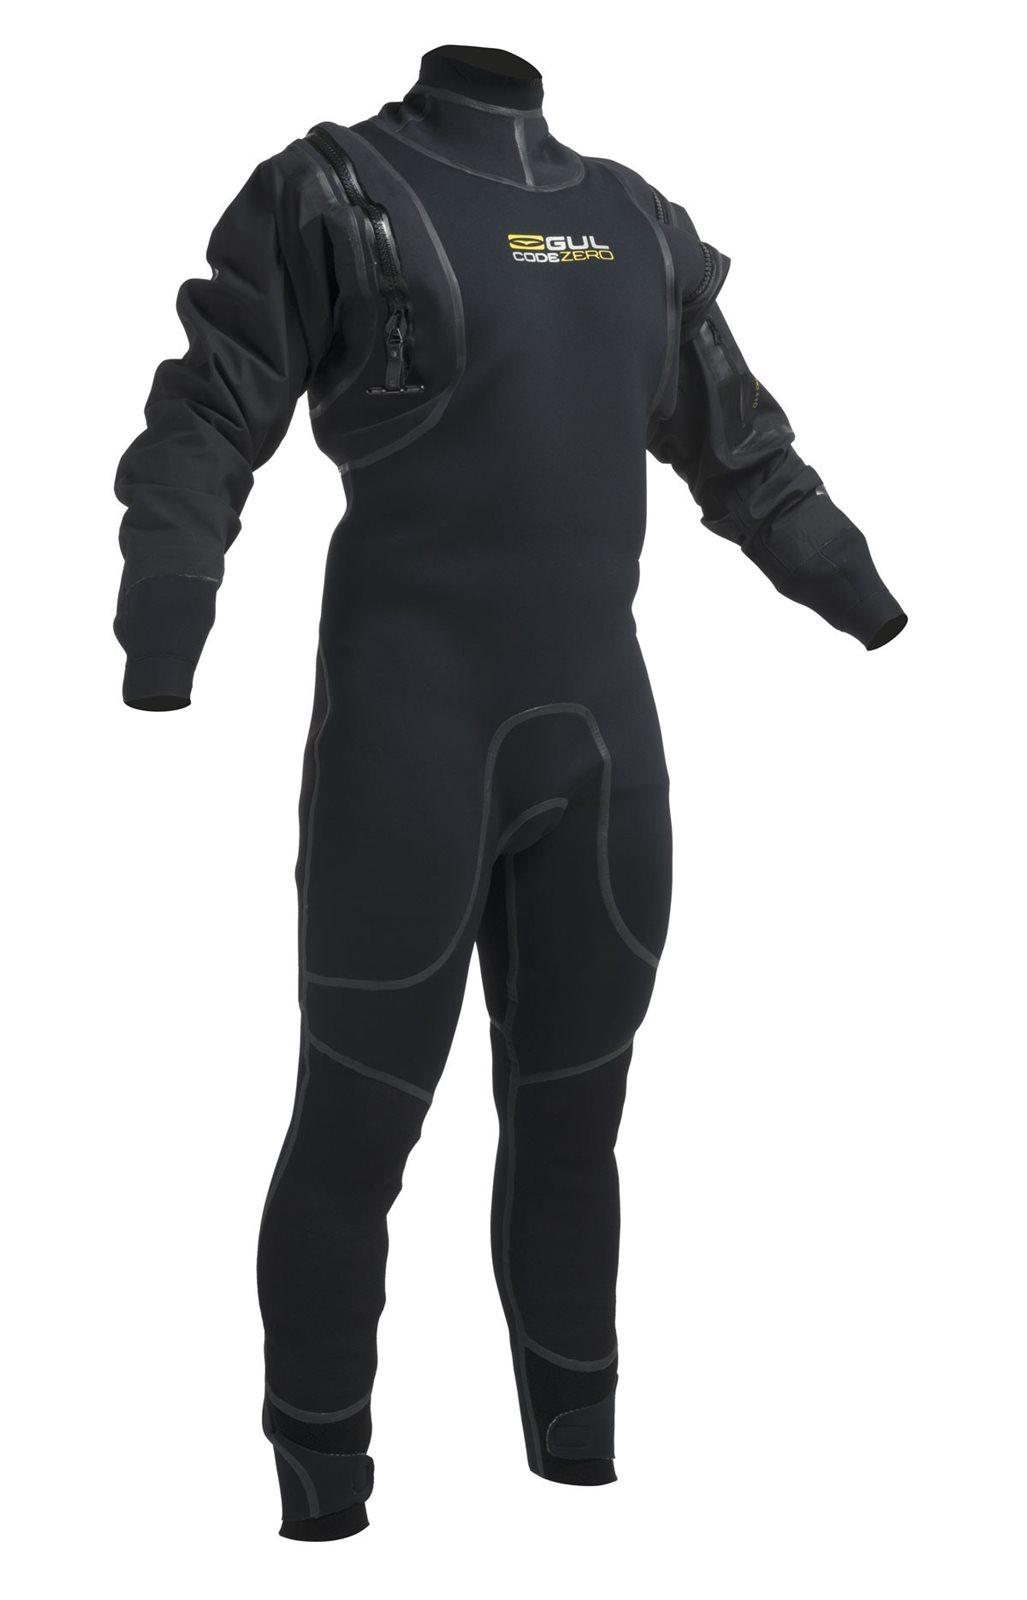 Polosuchý oblek GUL CODE ZERO HYBRID 4mm - M